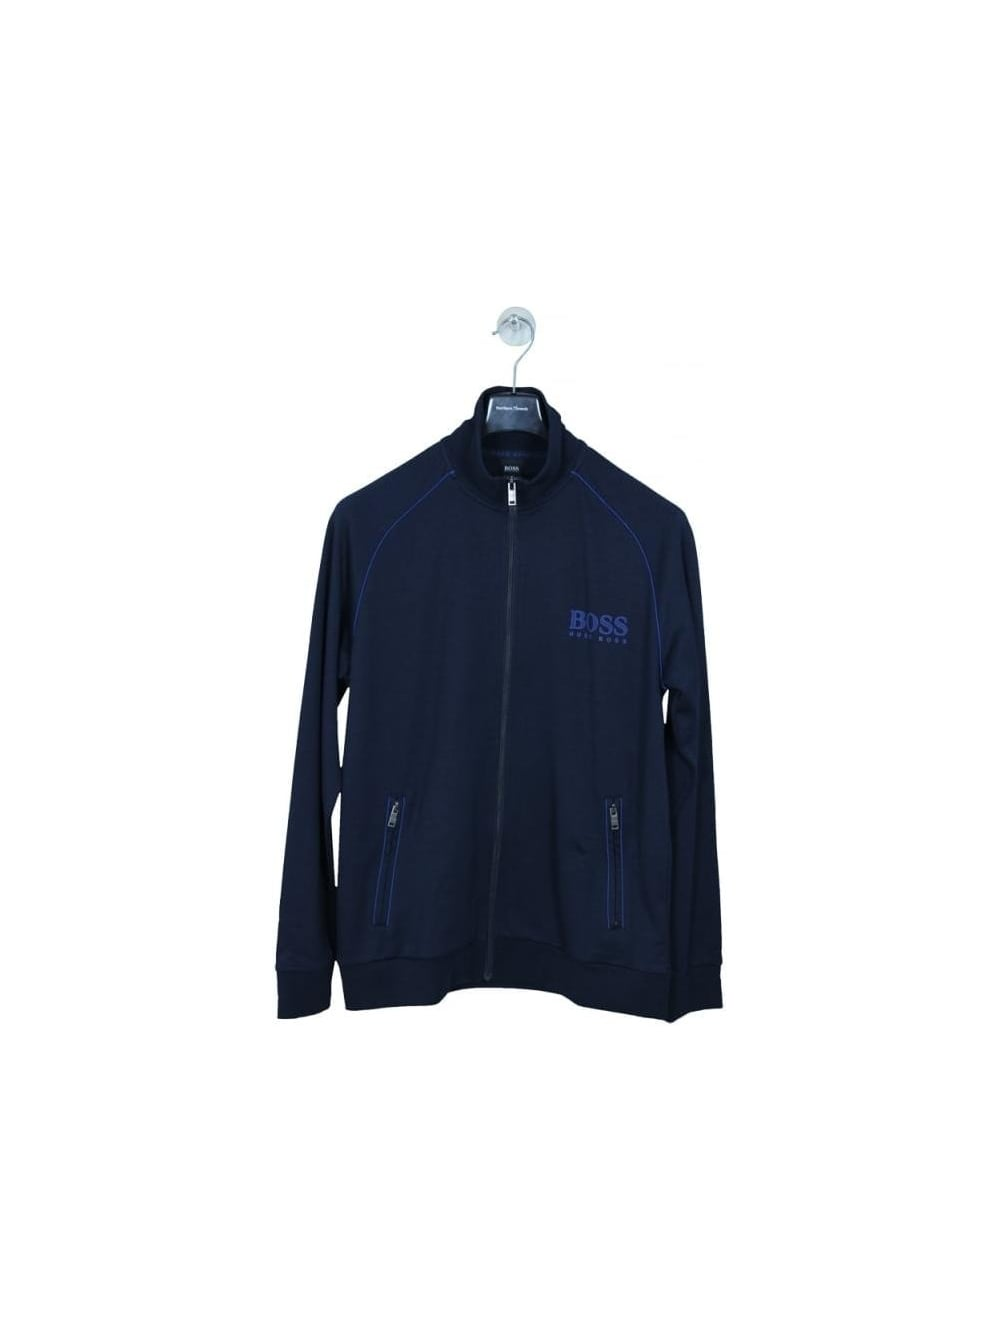 hugo boss zip through jacket